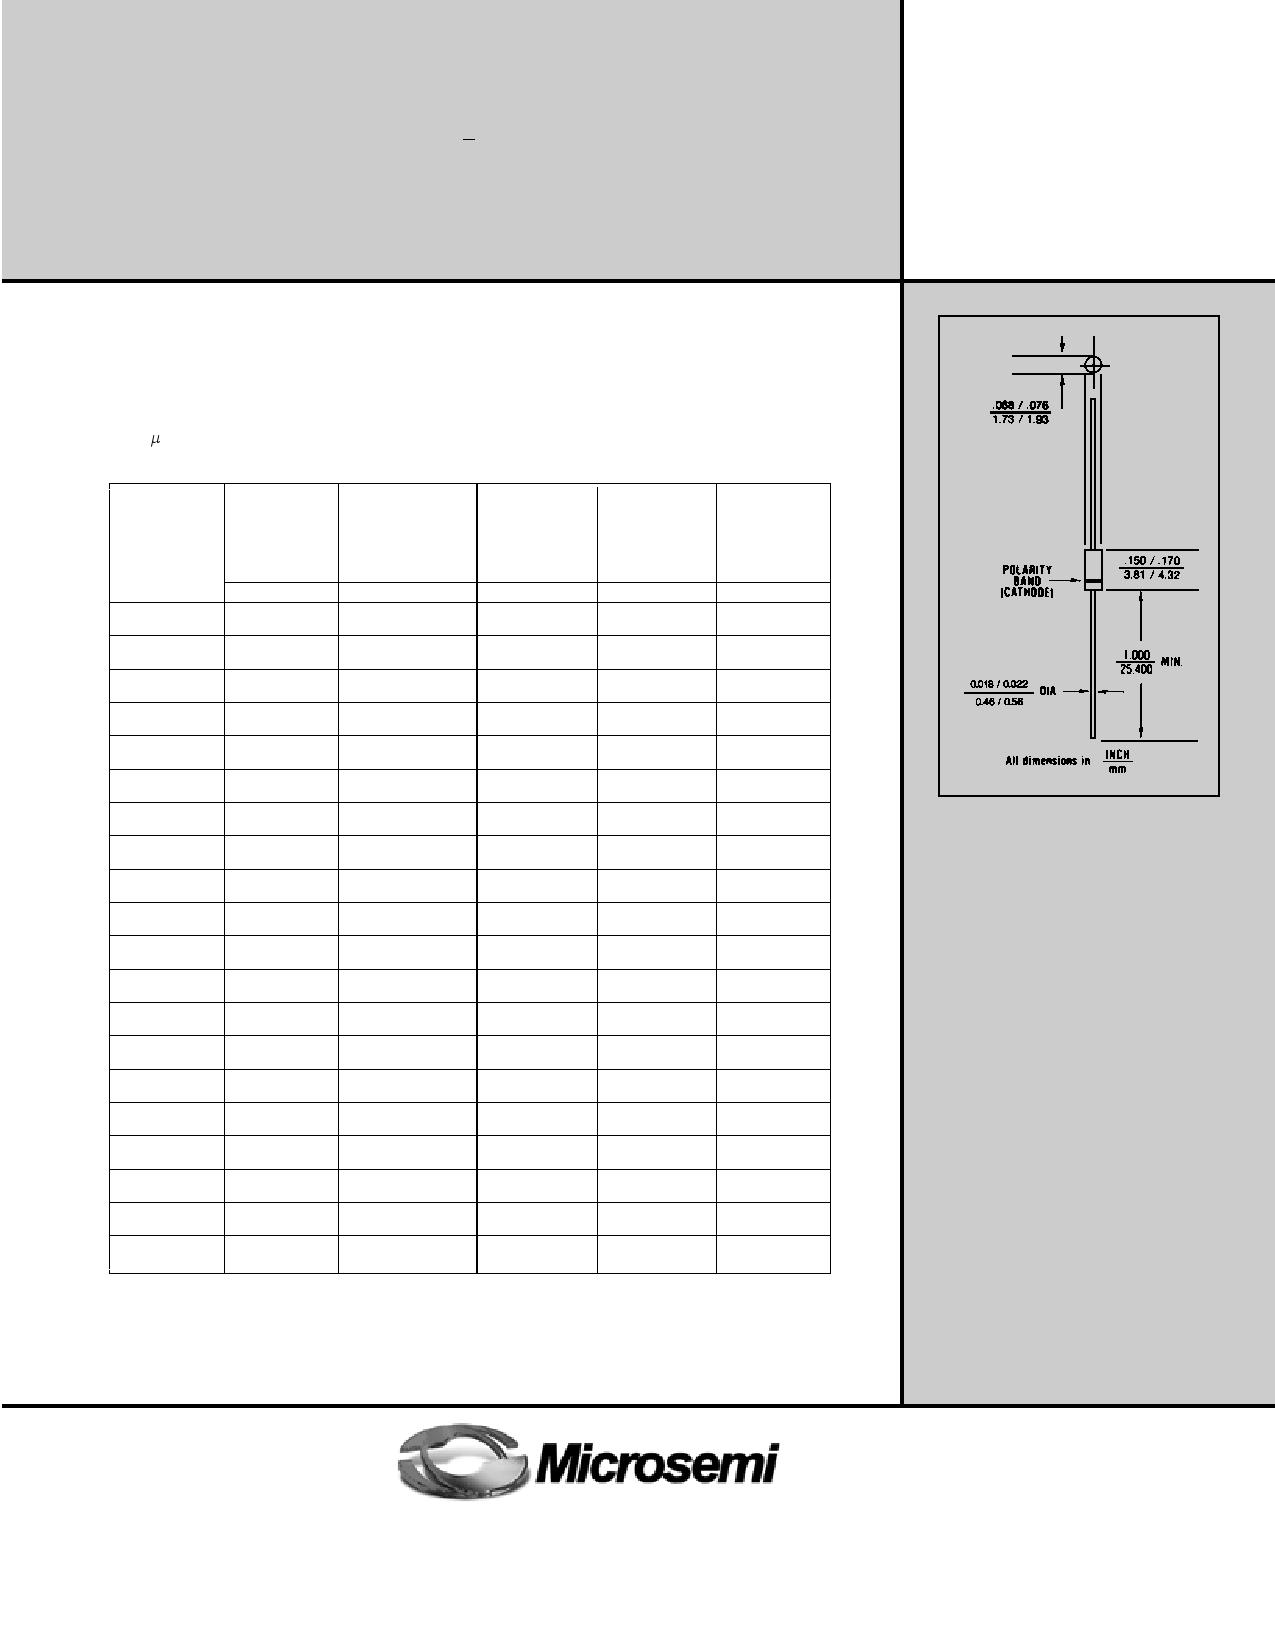 1N4583 datasheet